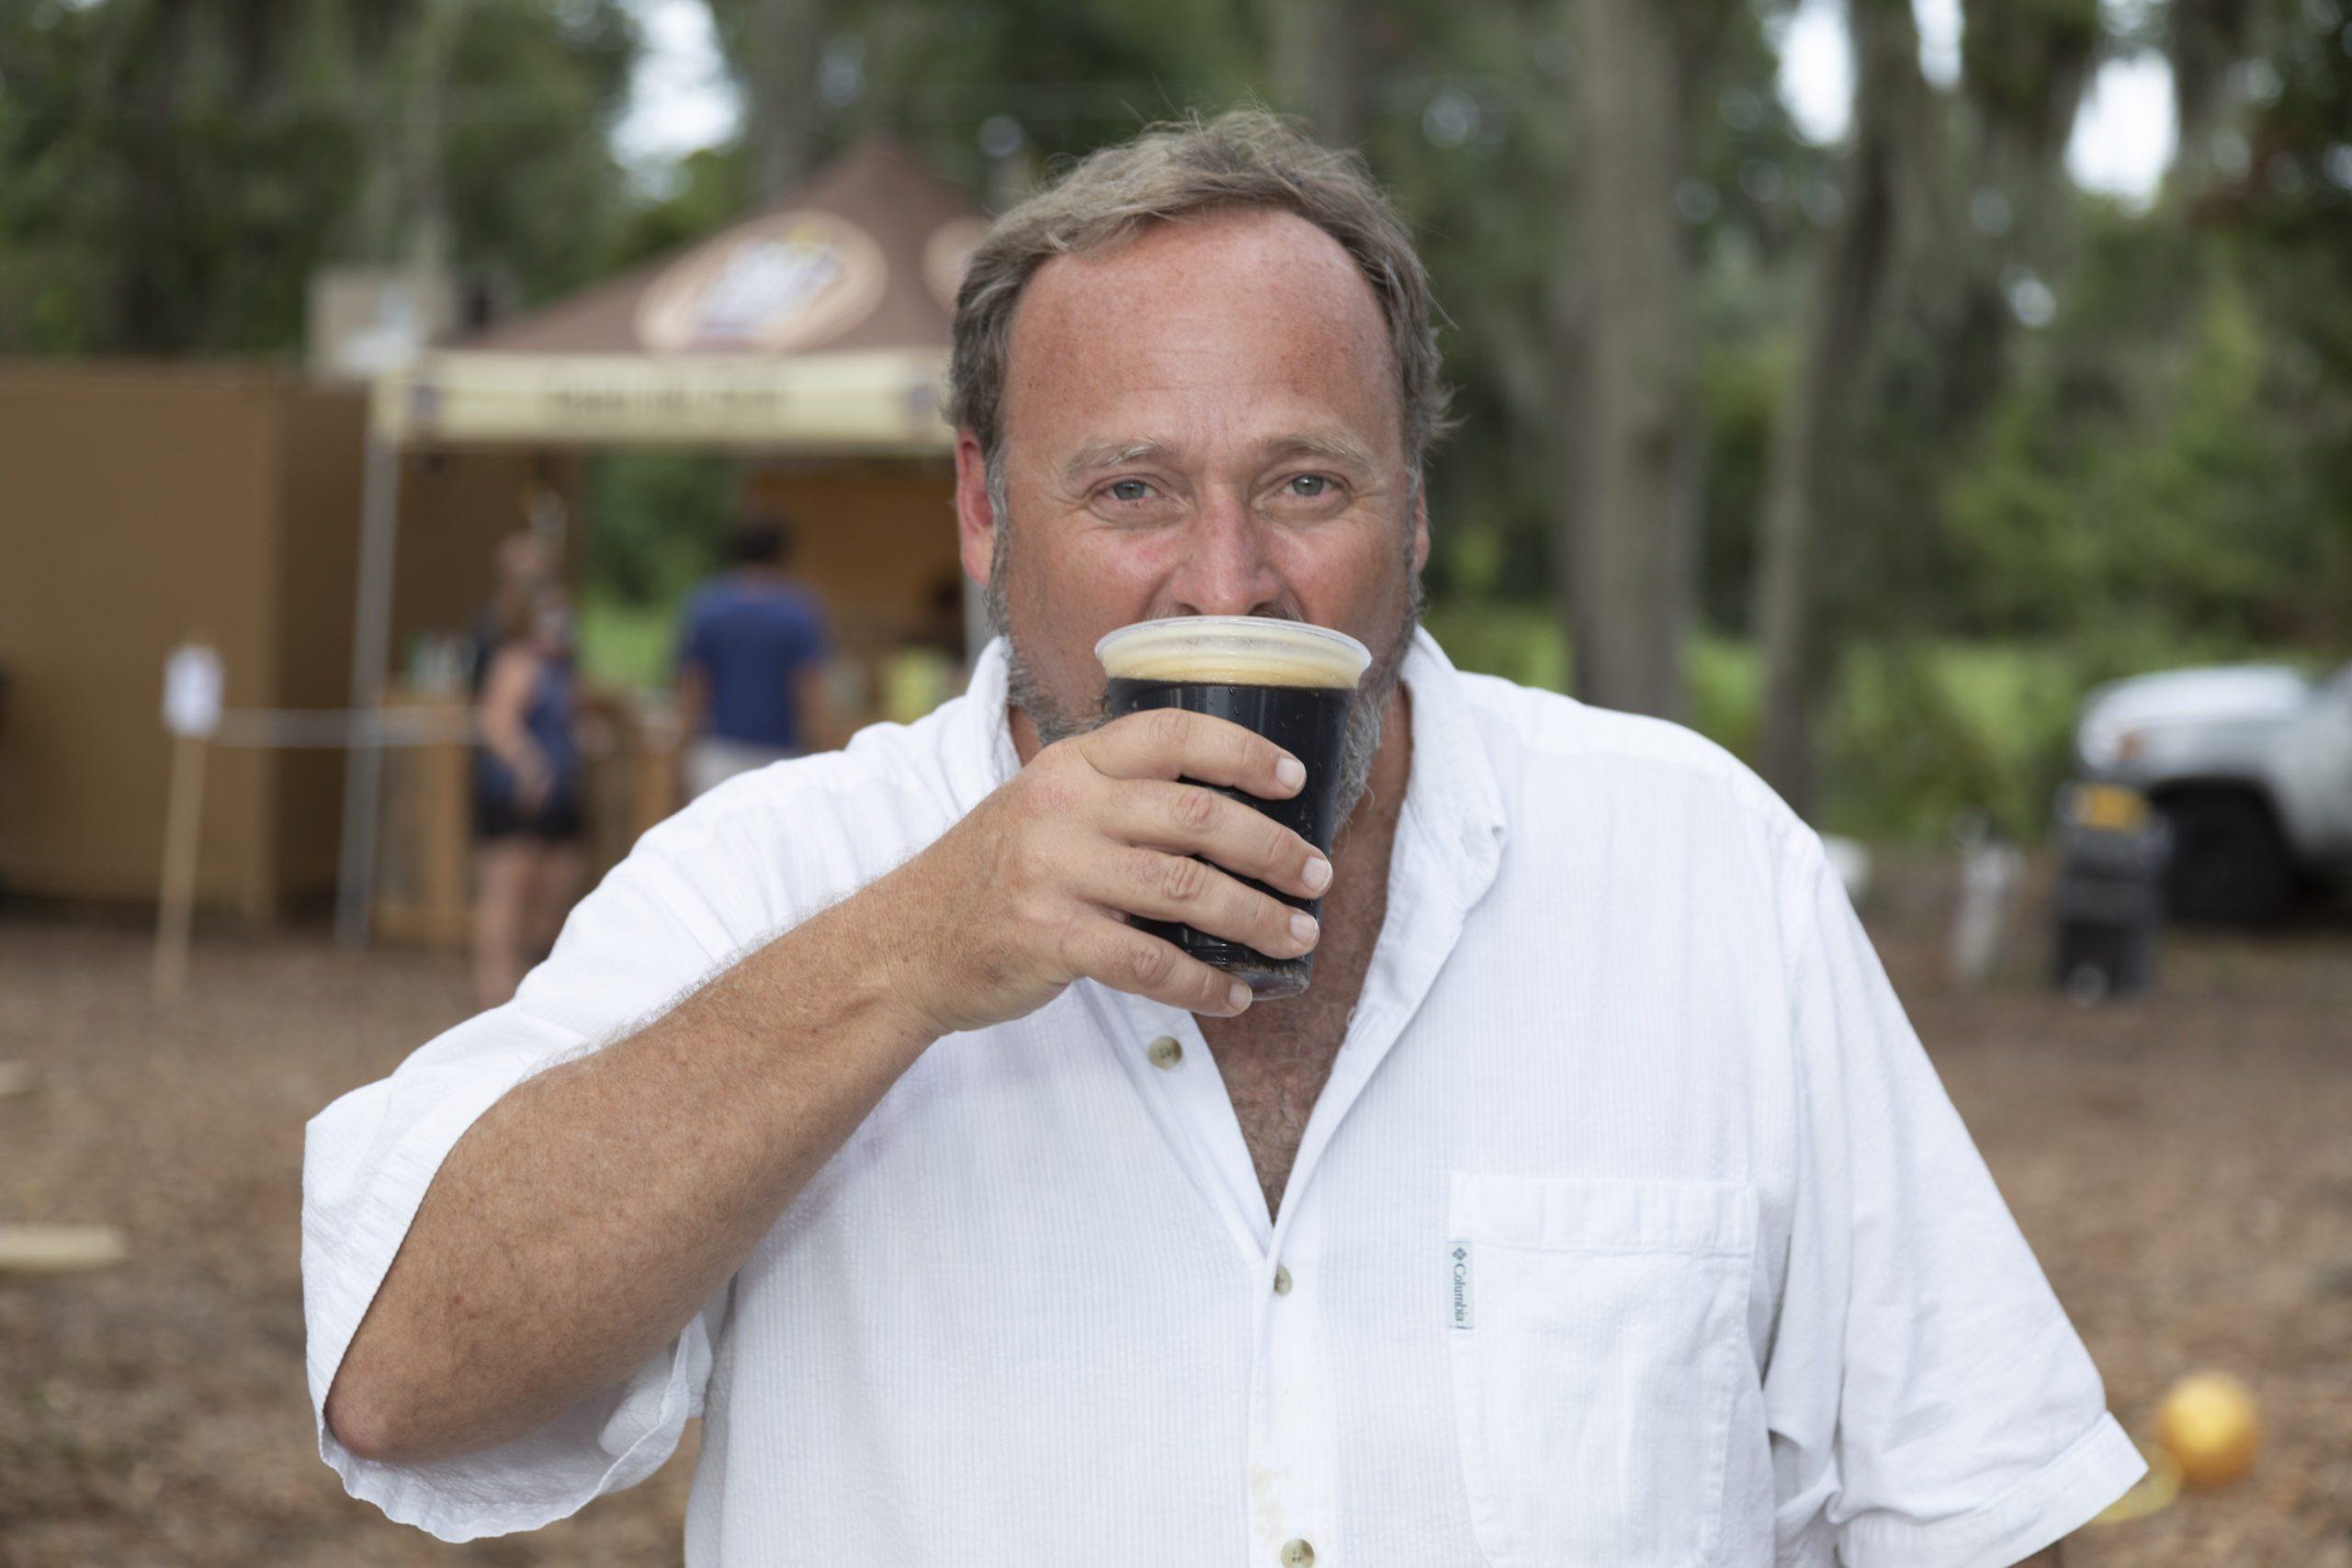 Port Royal Community Beer Garden